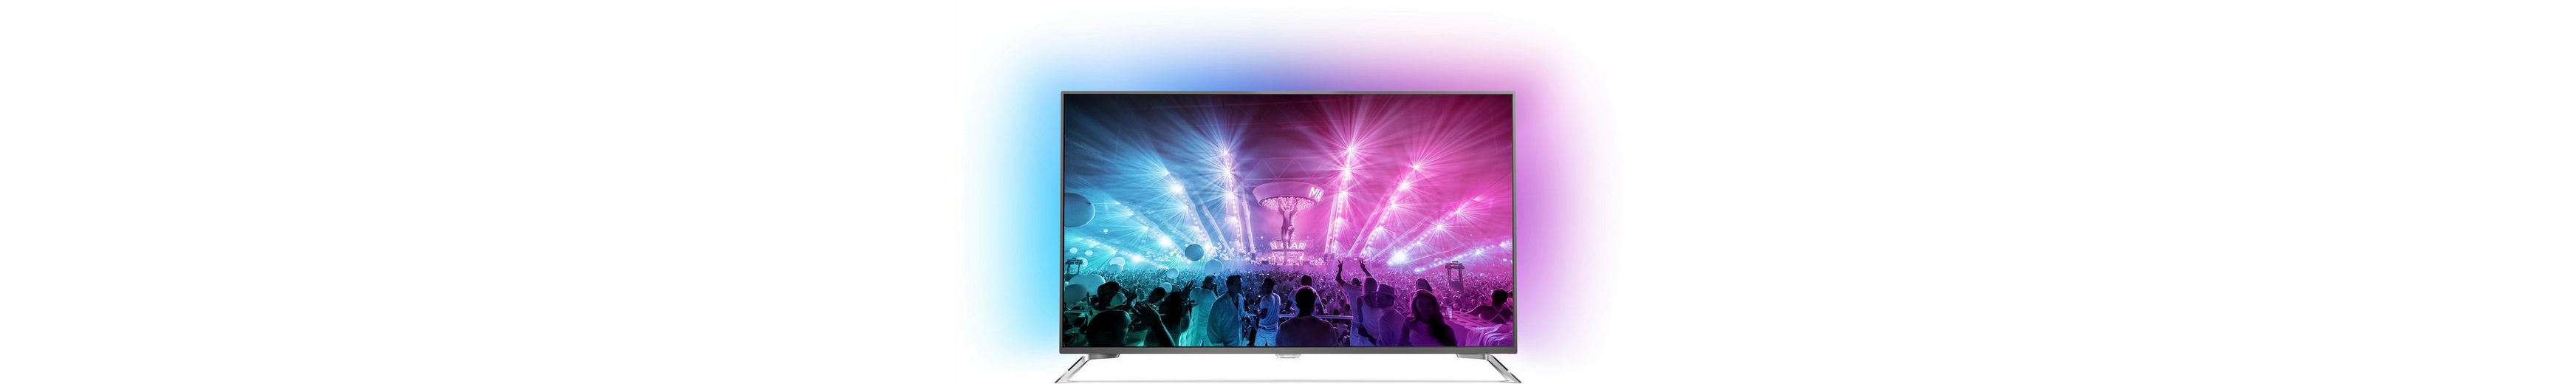 Philips 65PUS7101/12, LED Fernseher, 164 cm (65 Zoll), 2160p (4K Ultra HD) Ambilight, Smart-TV